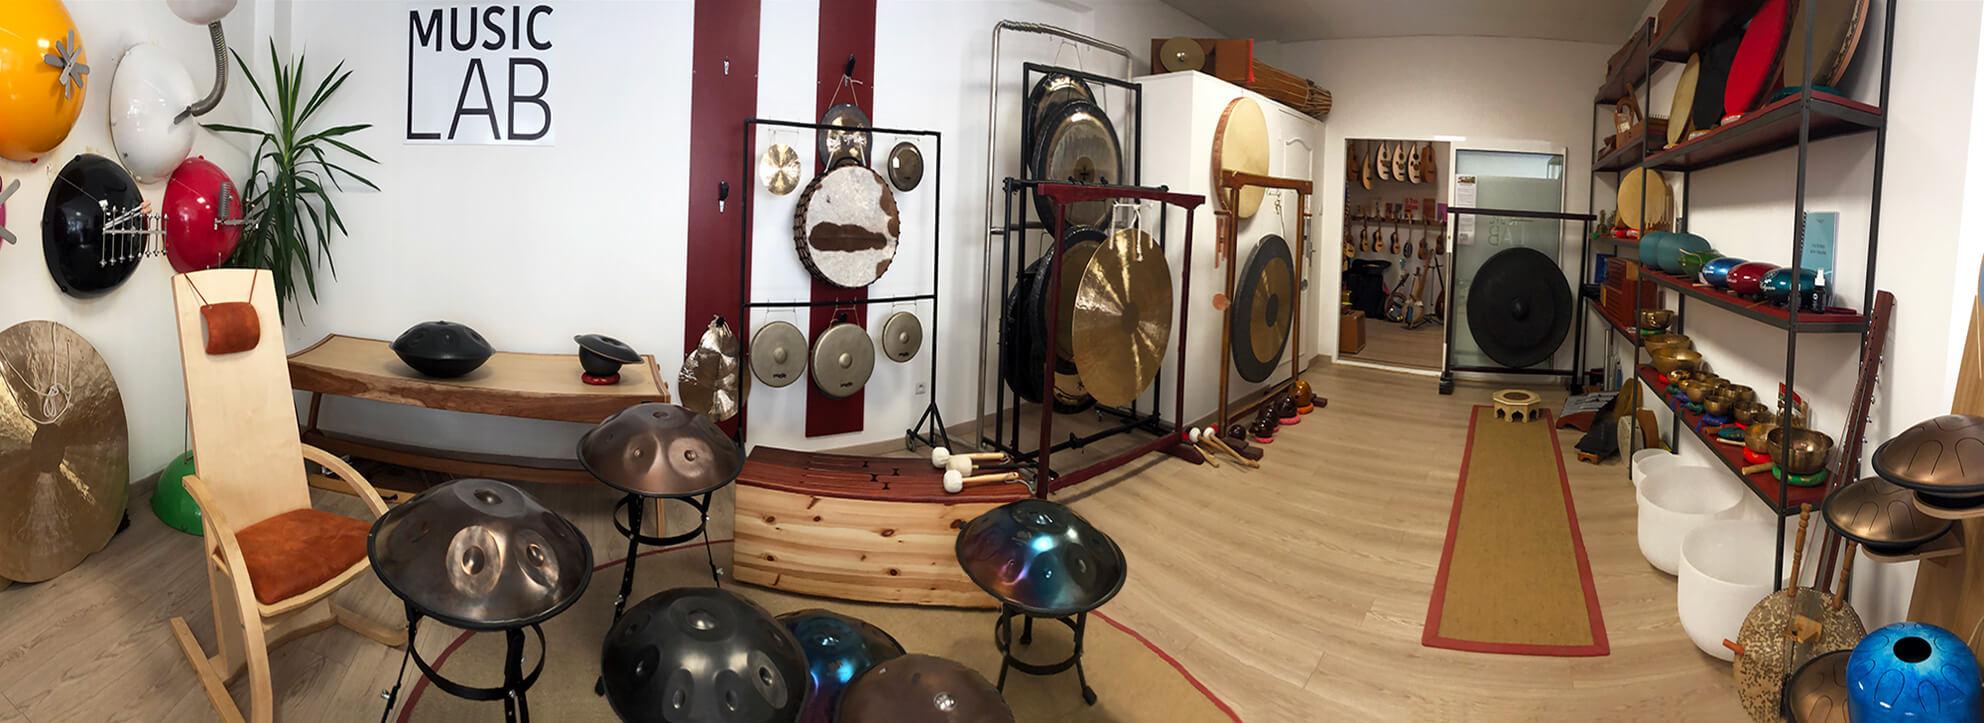 Music Lab de Djoliba Percussions